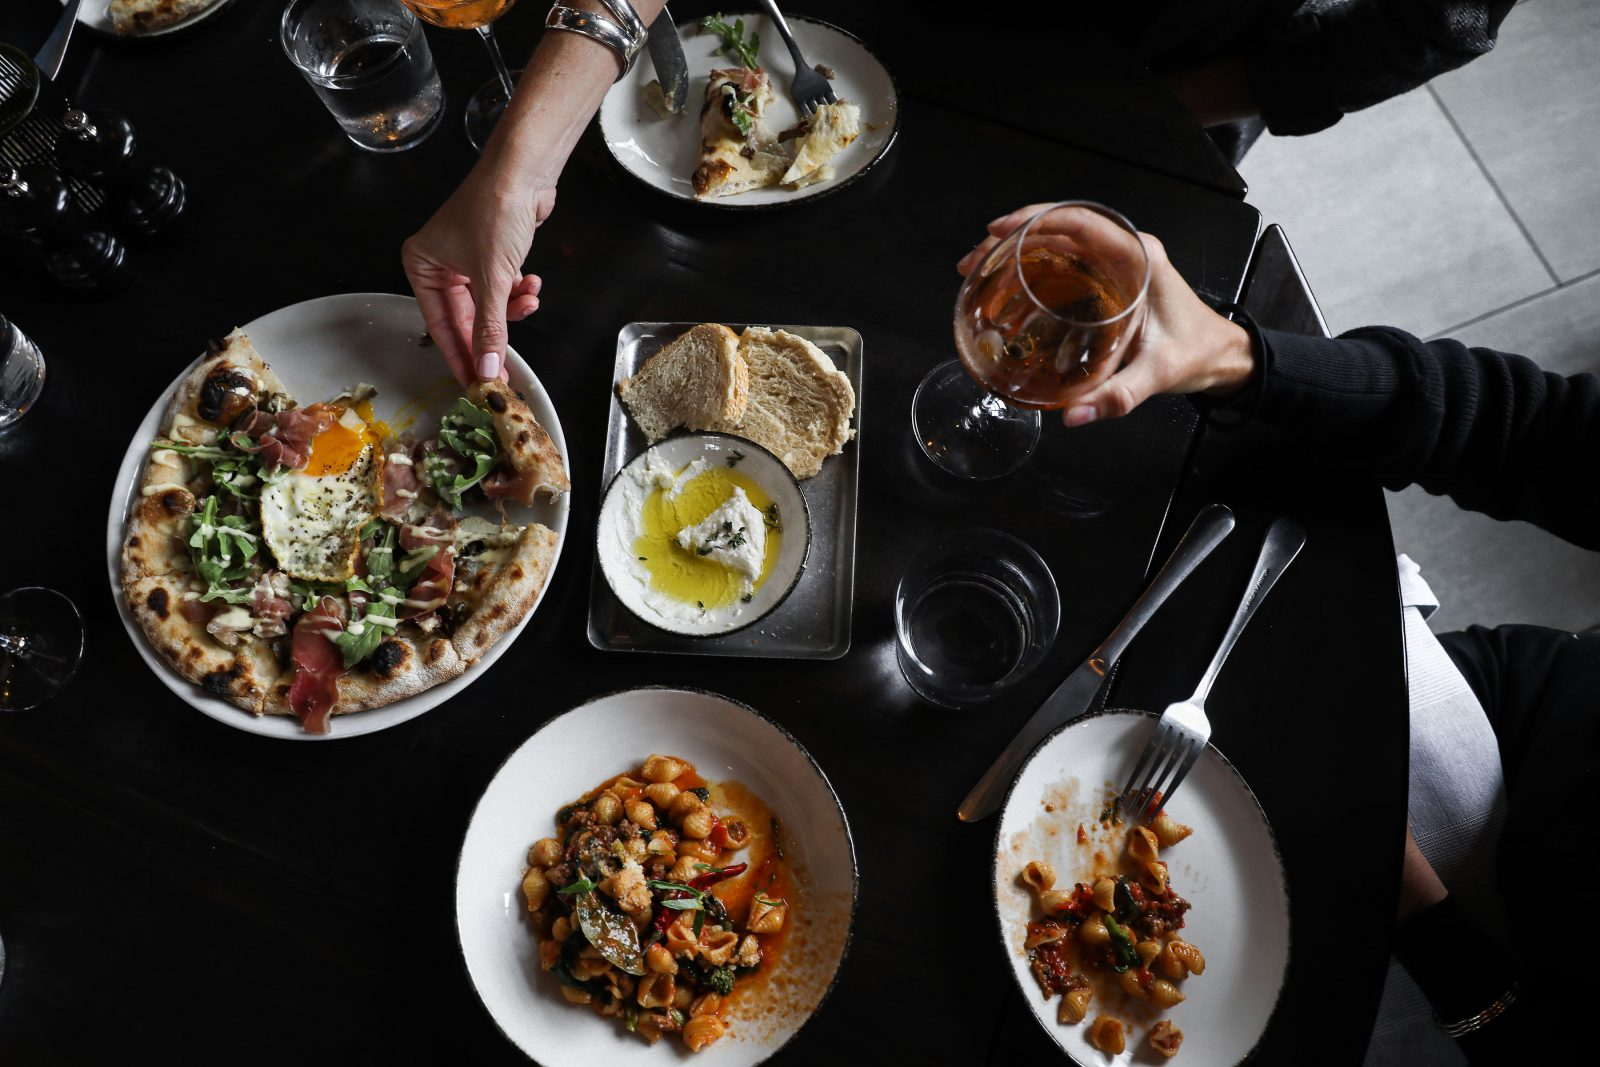 Full spread of Italian food at Culaccino